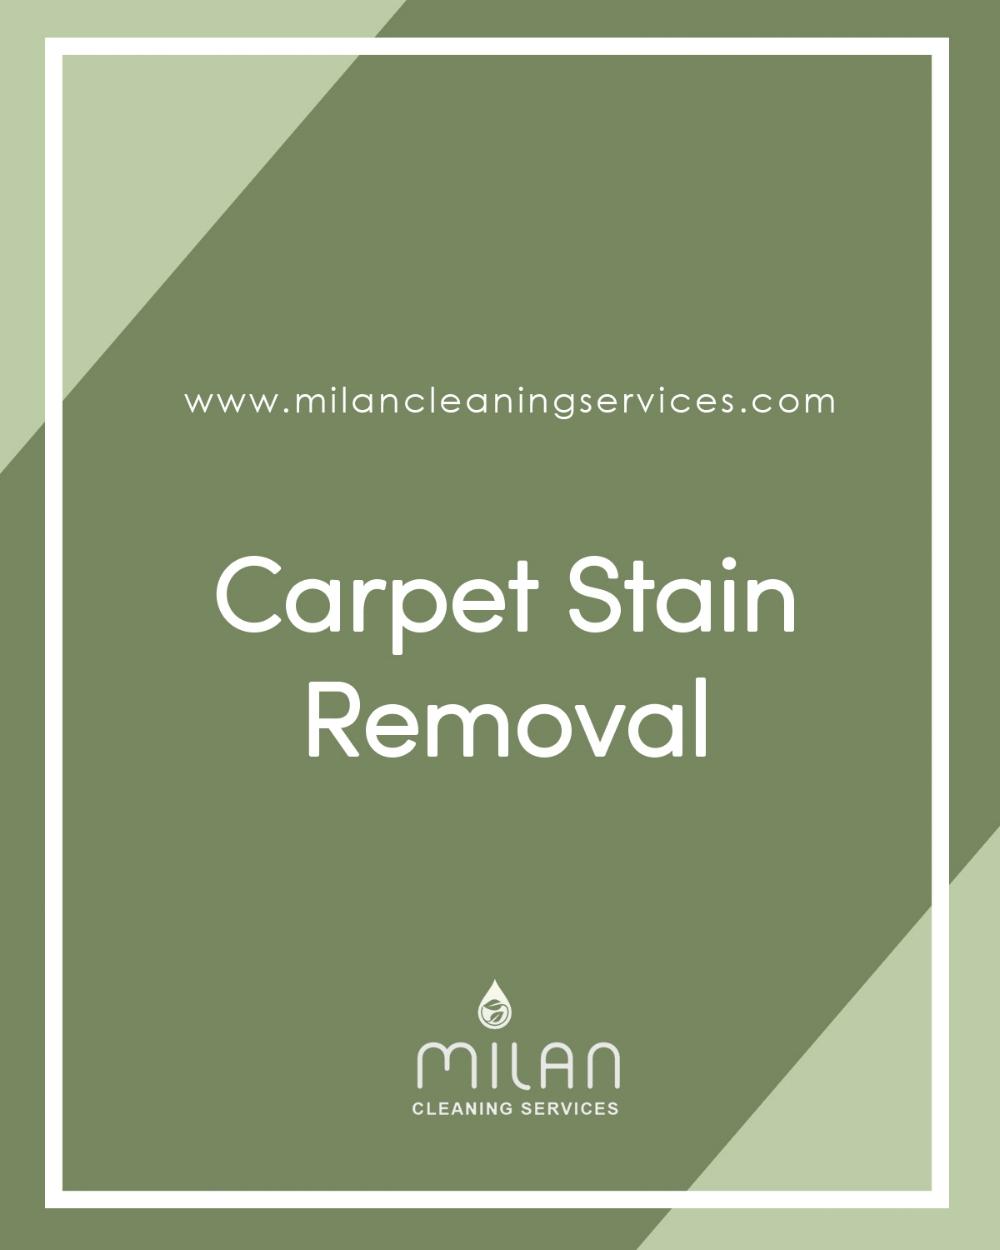 carpet-stain-removal.jpg